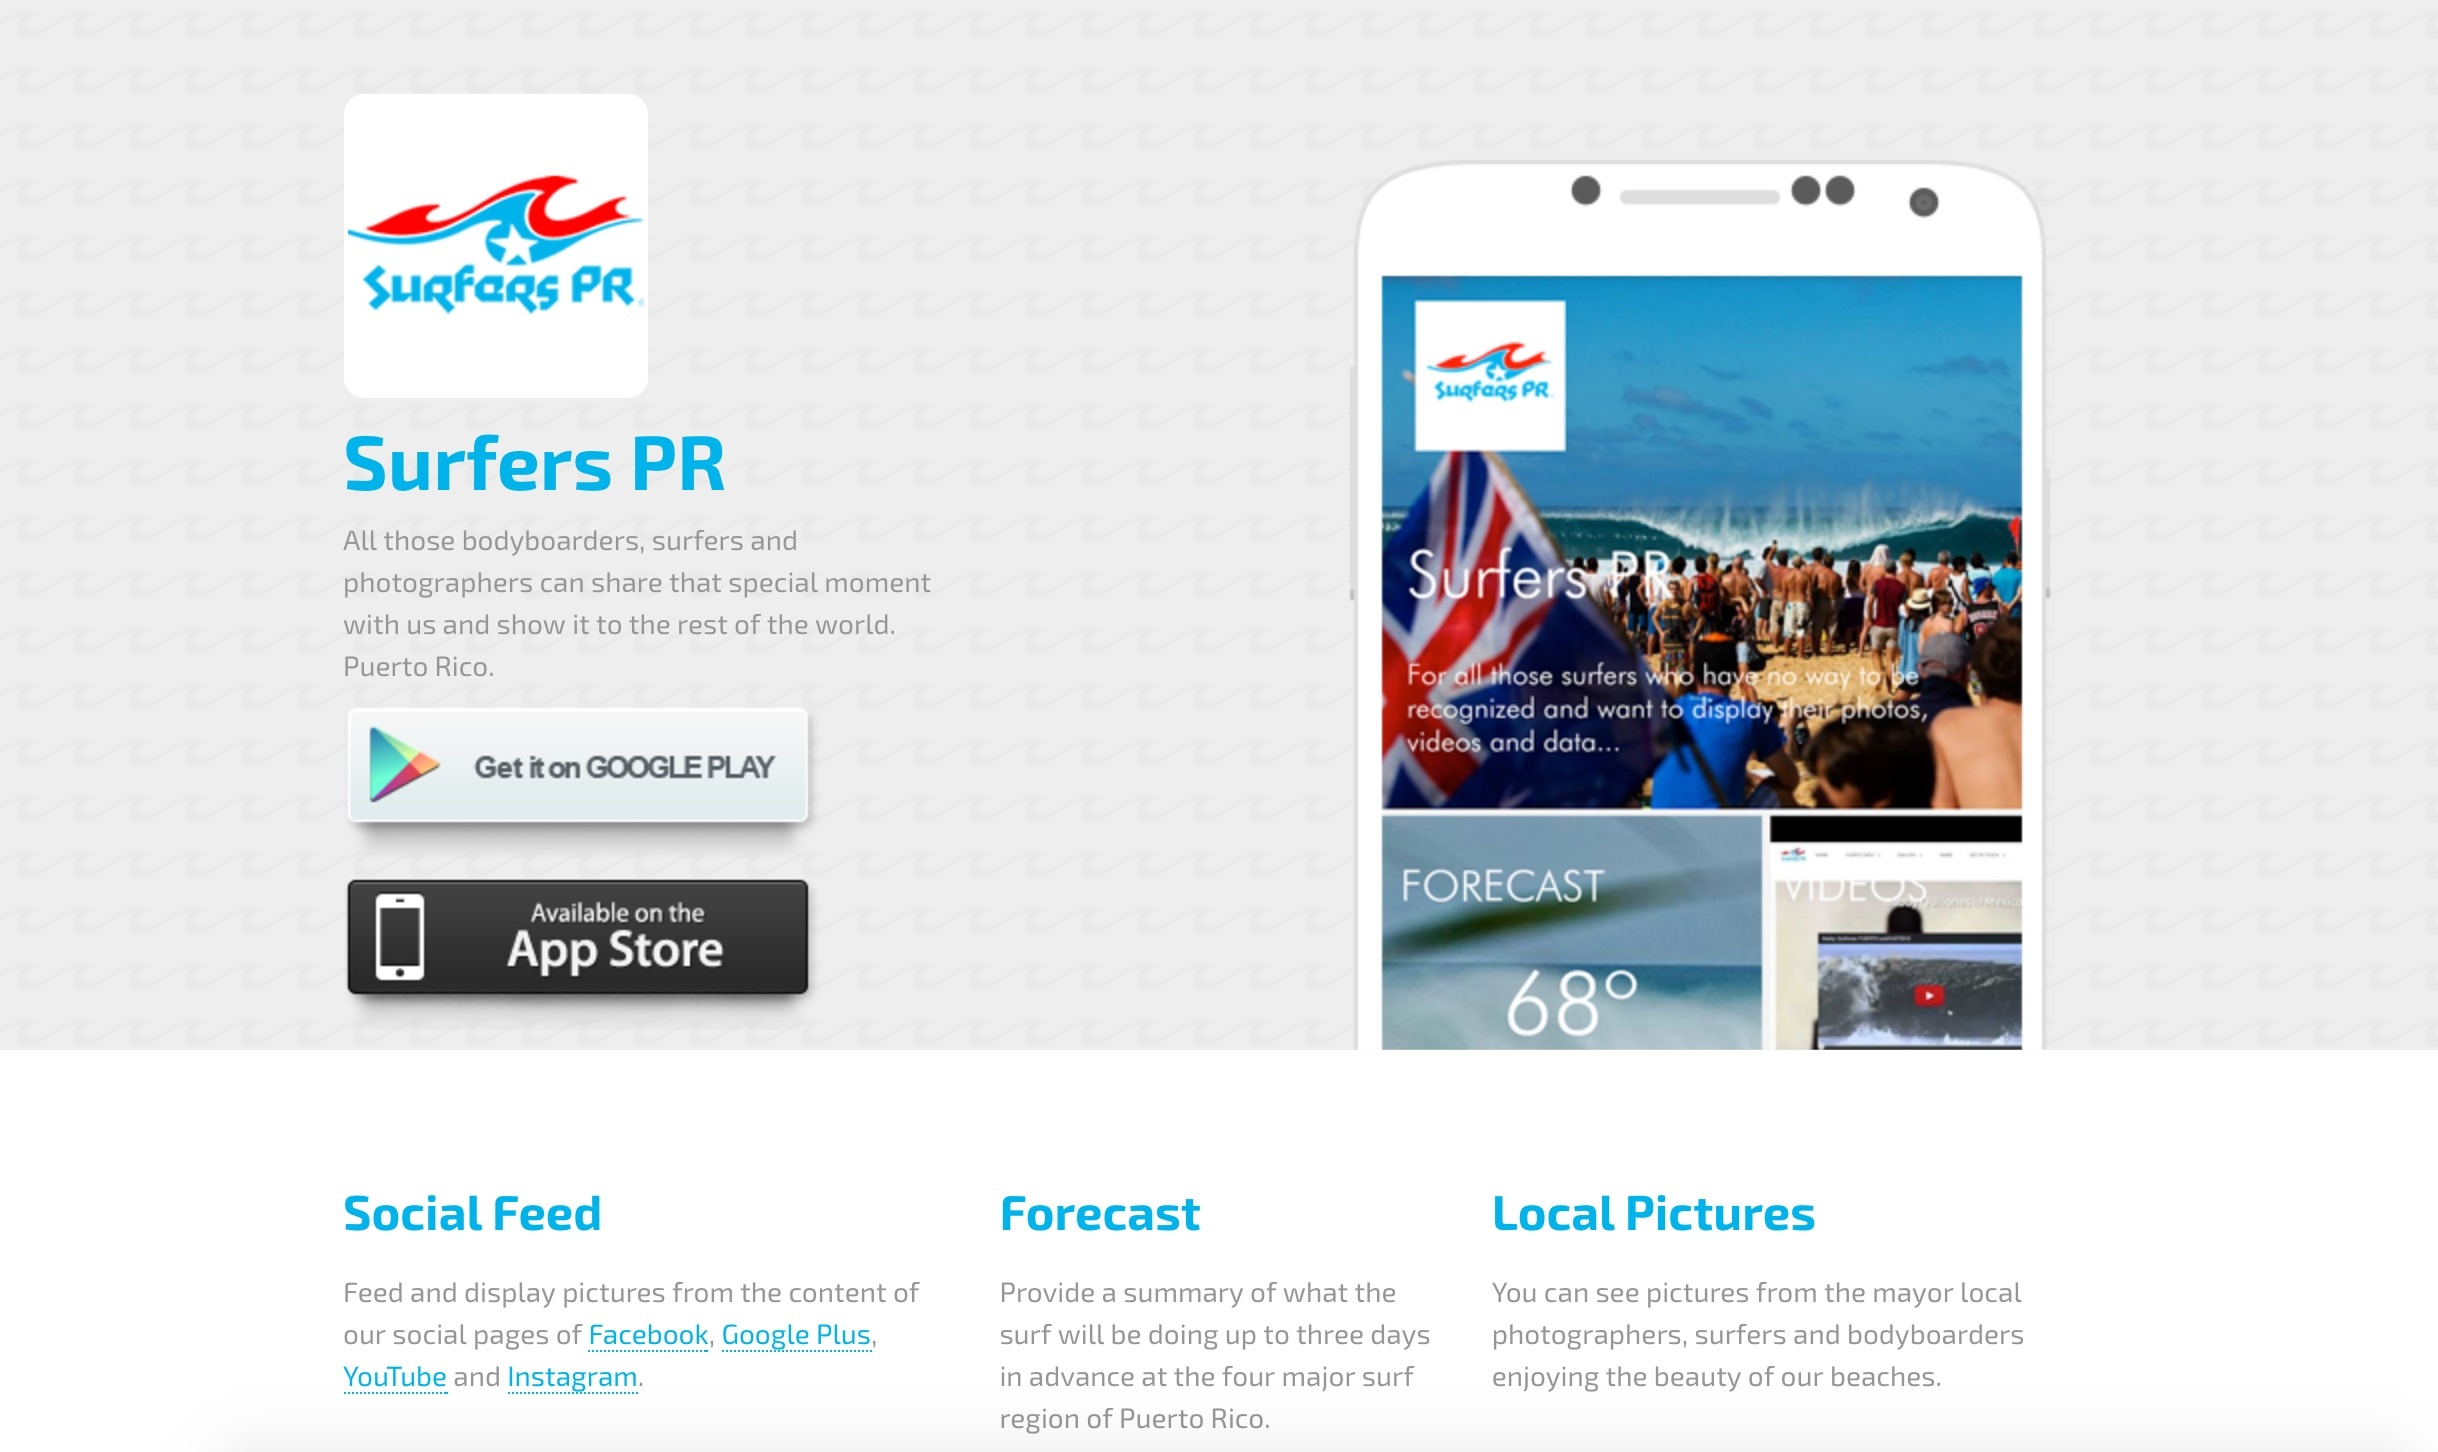 Surfers PR